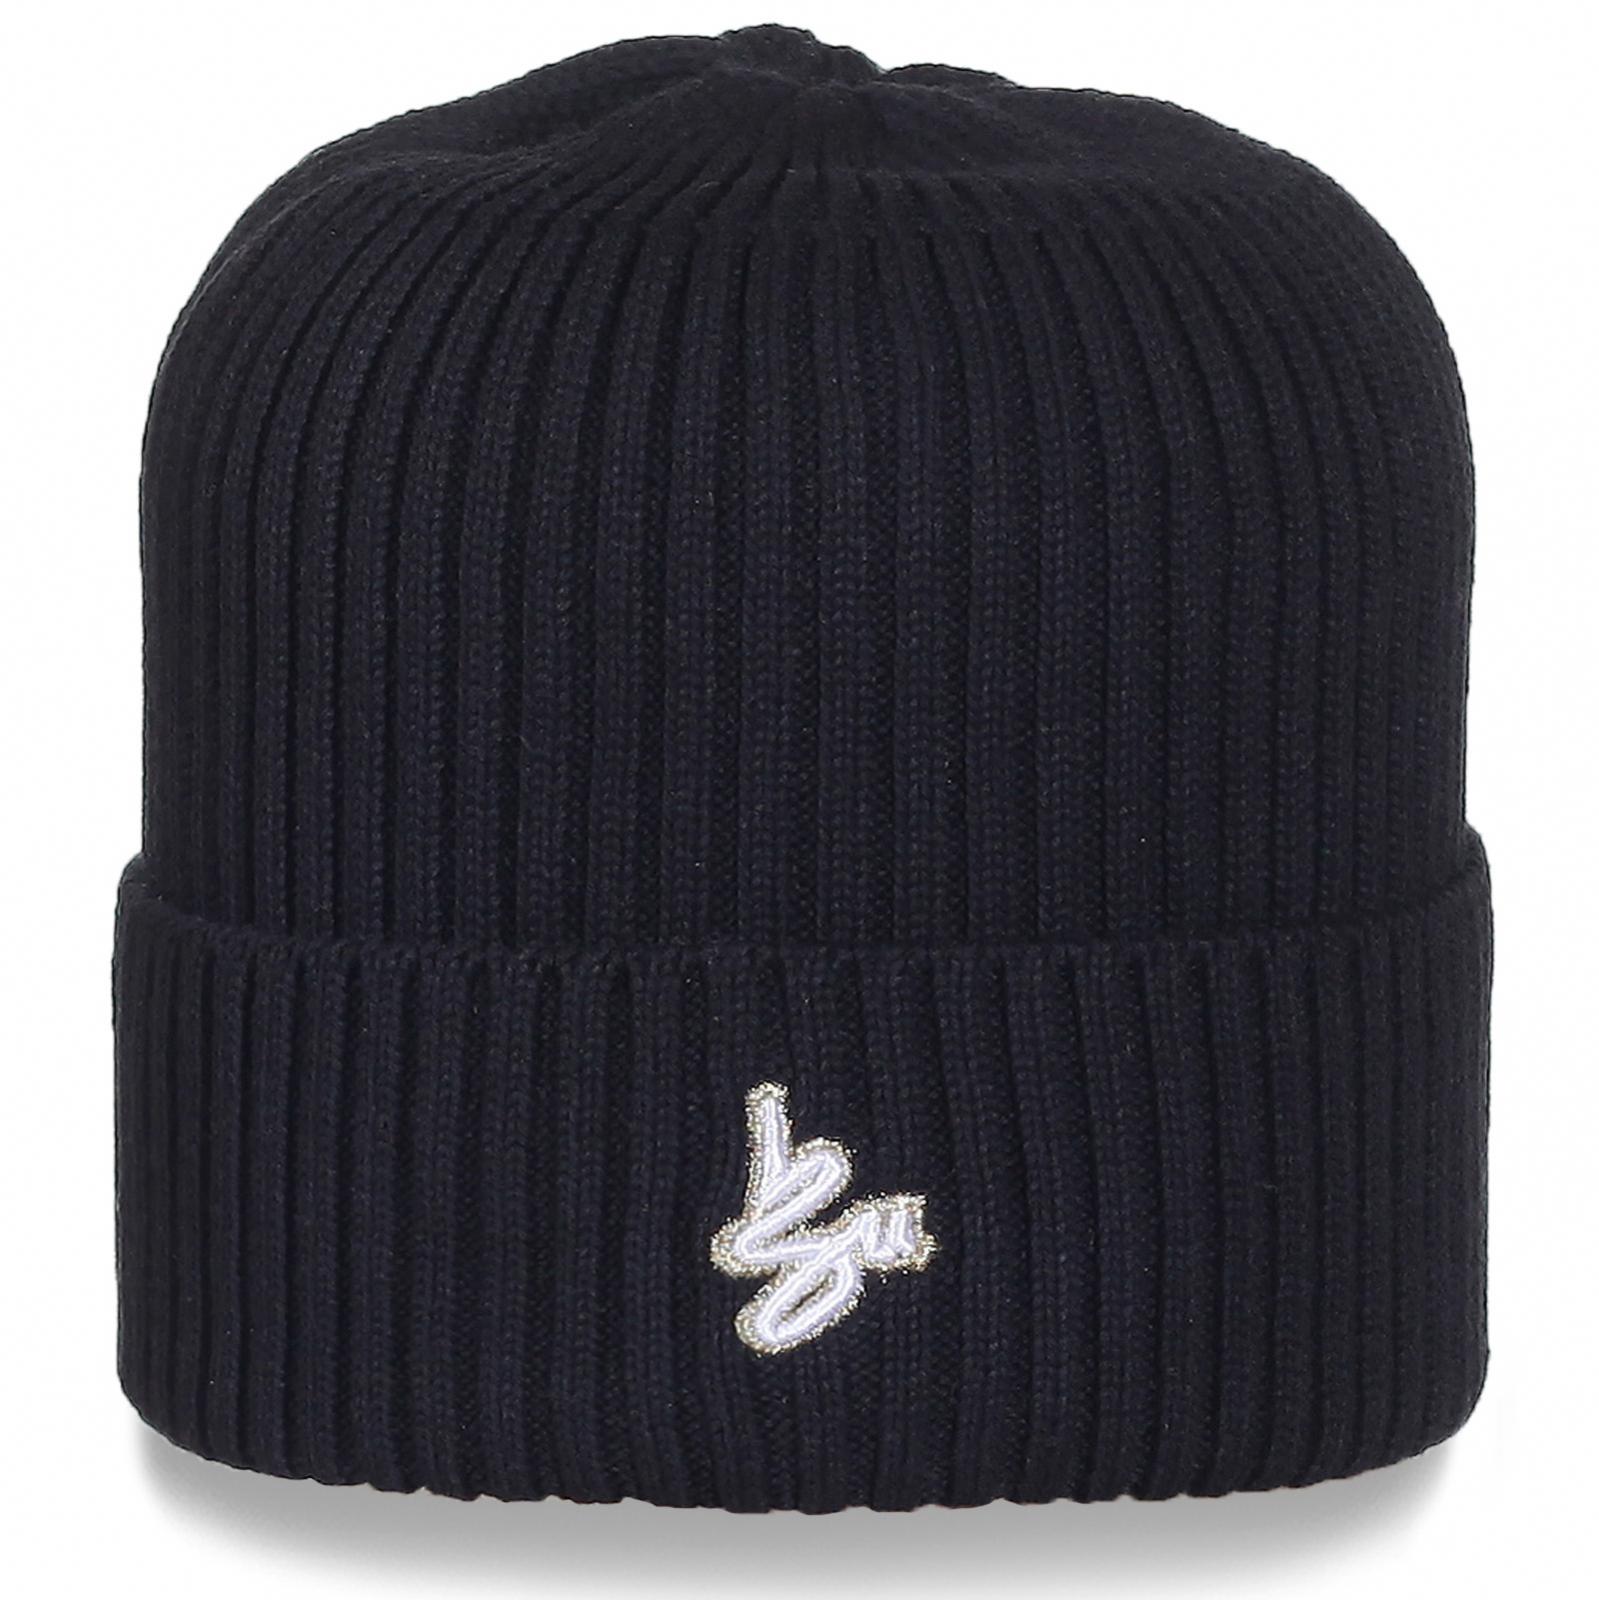 Мужская шапка Sportswear черного цвета